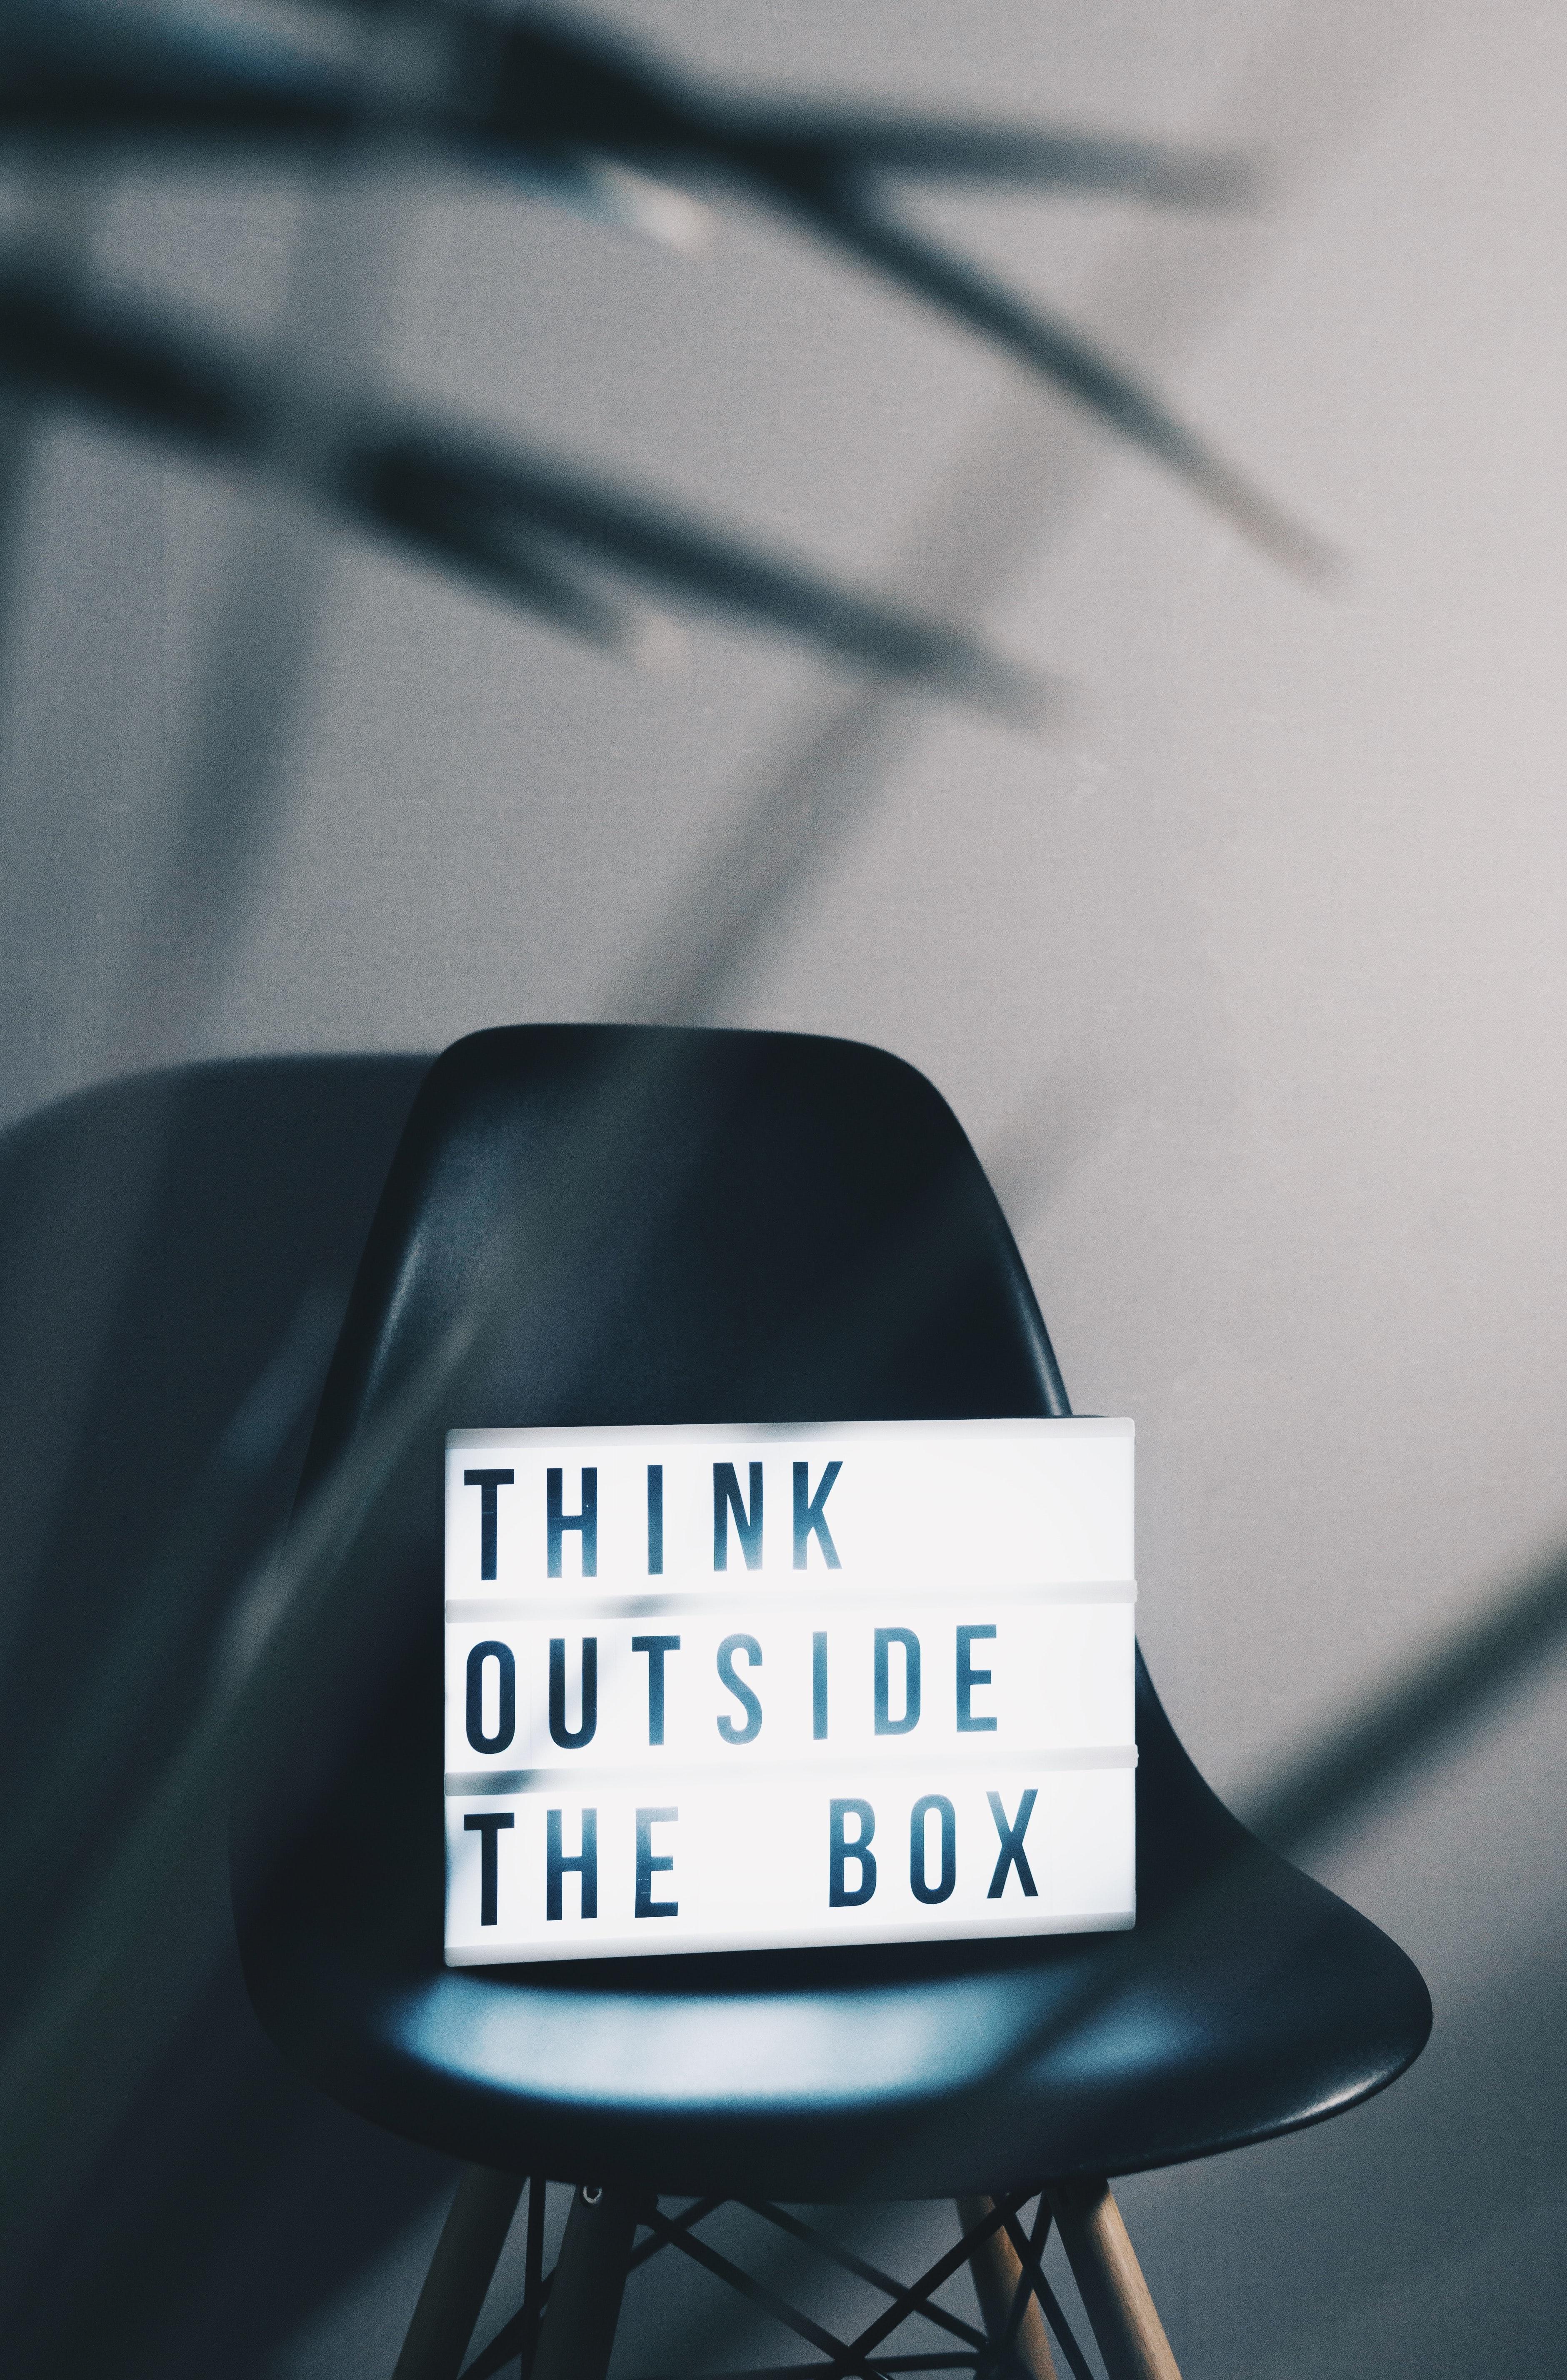 Think outside the box (by Nikita Kachanovsky)